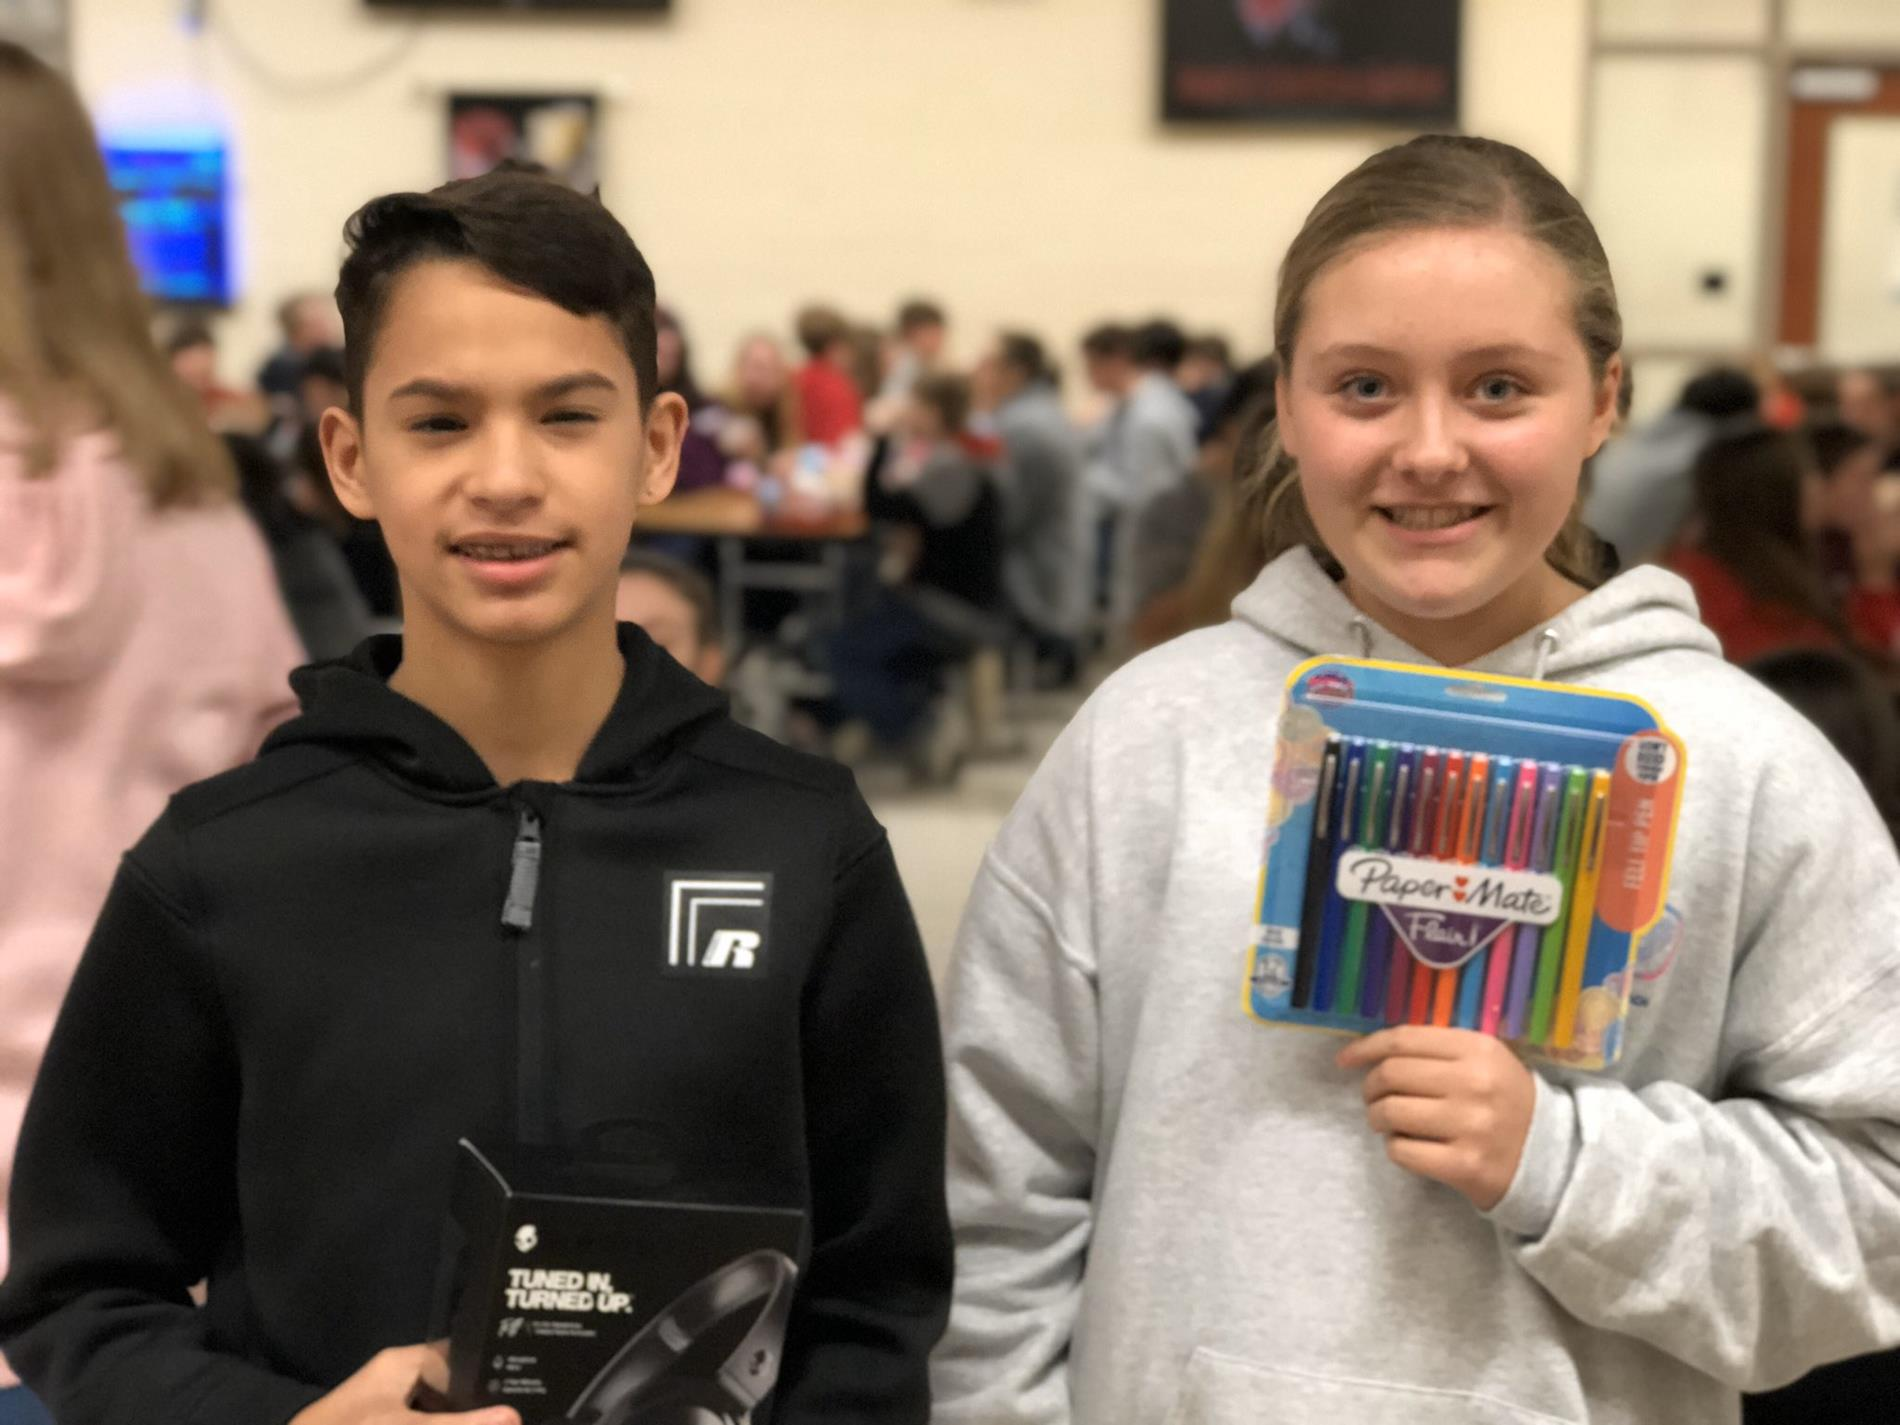 7th grade prize winners